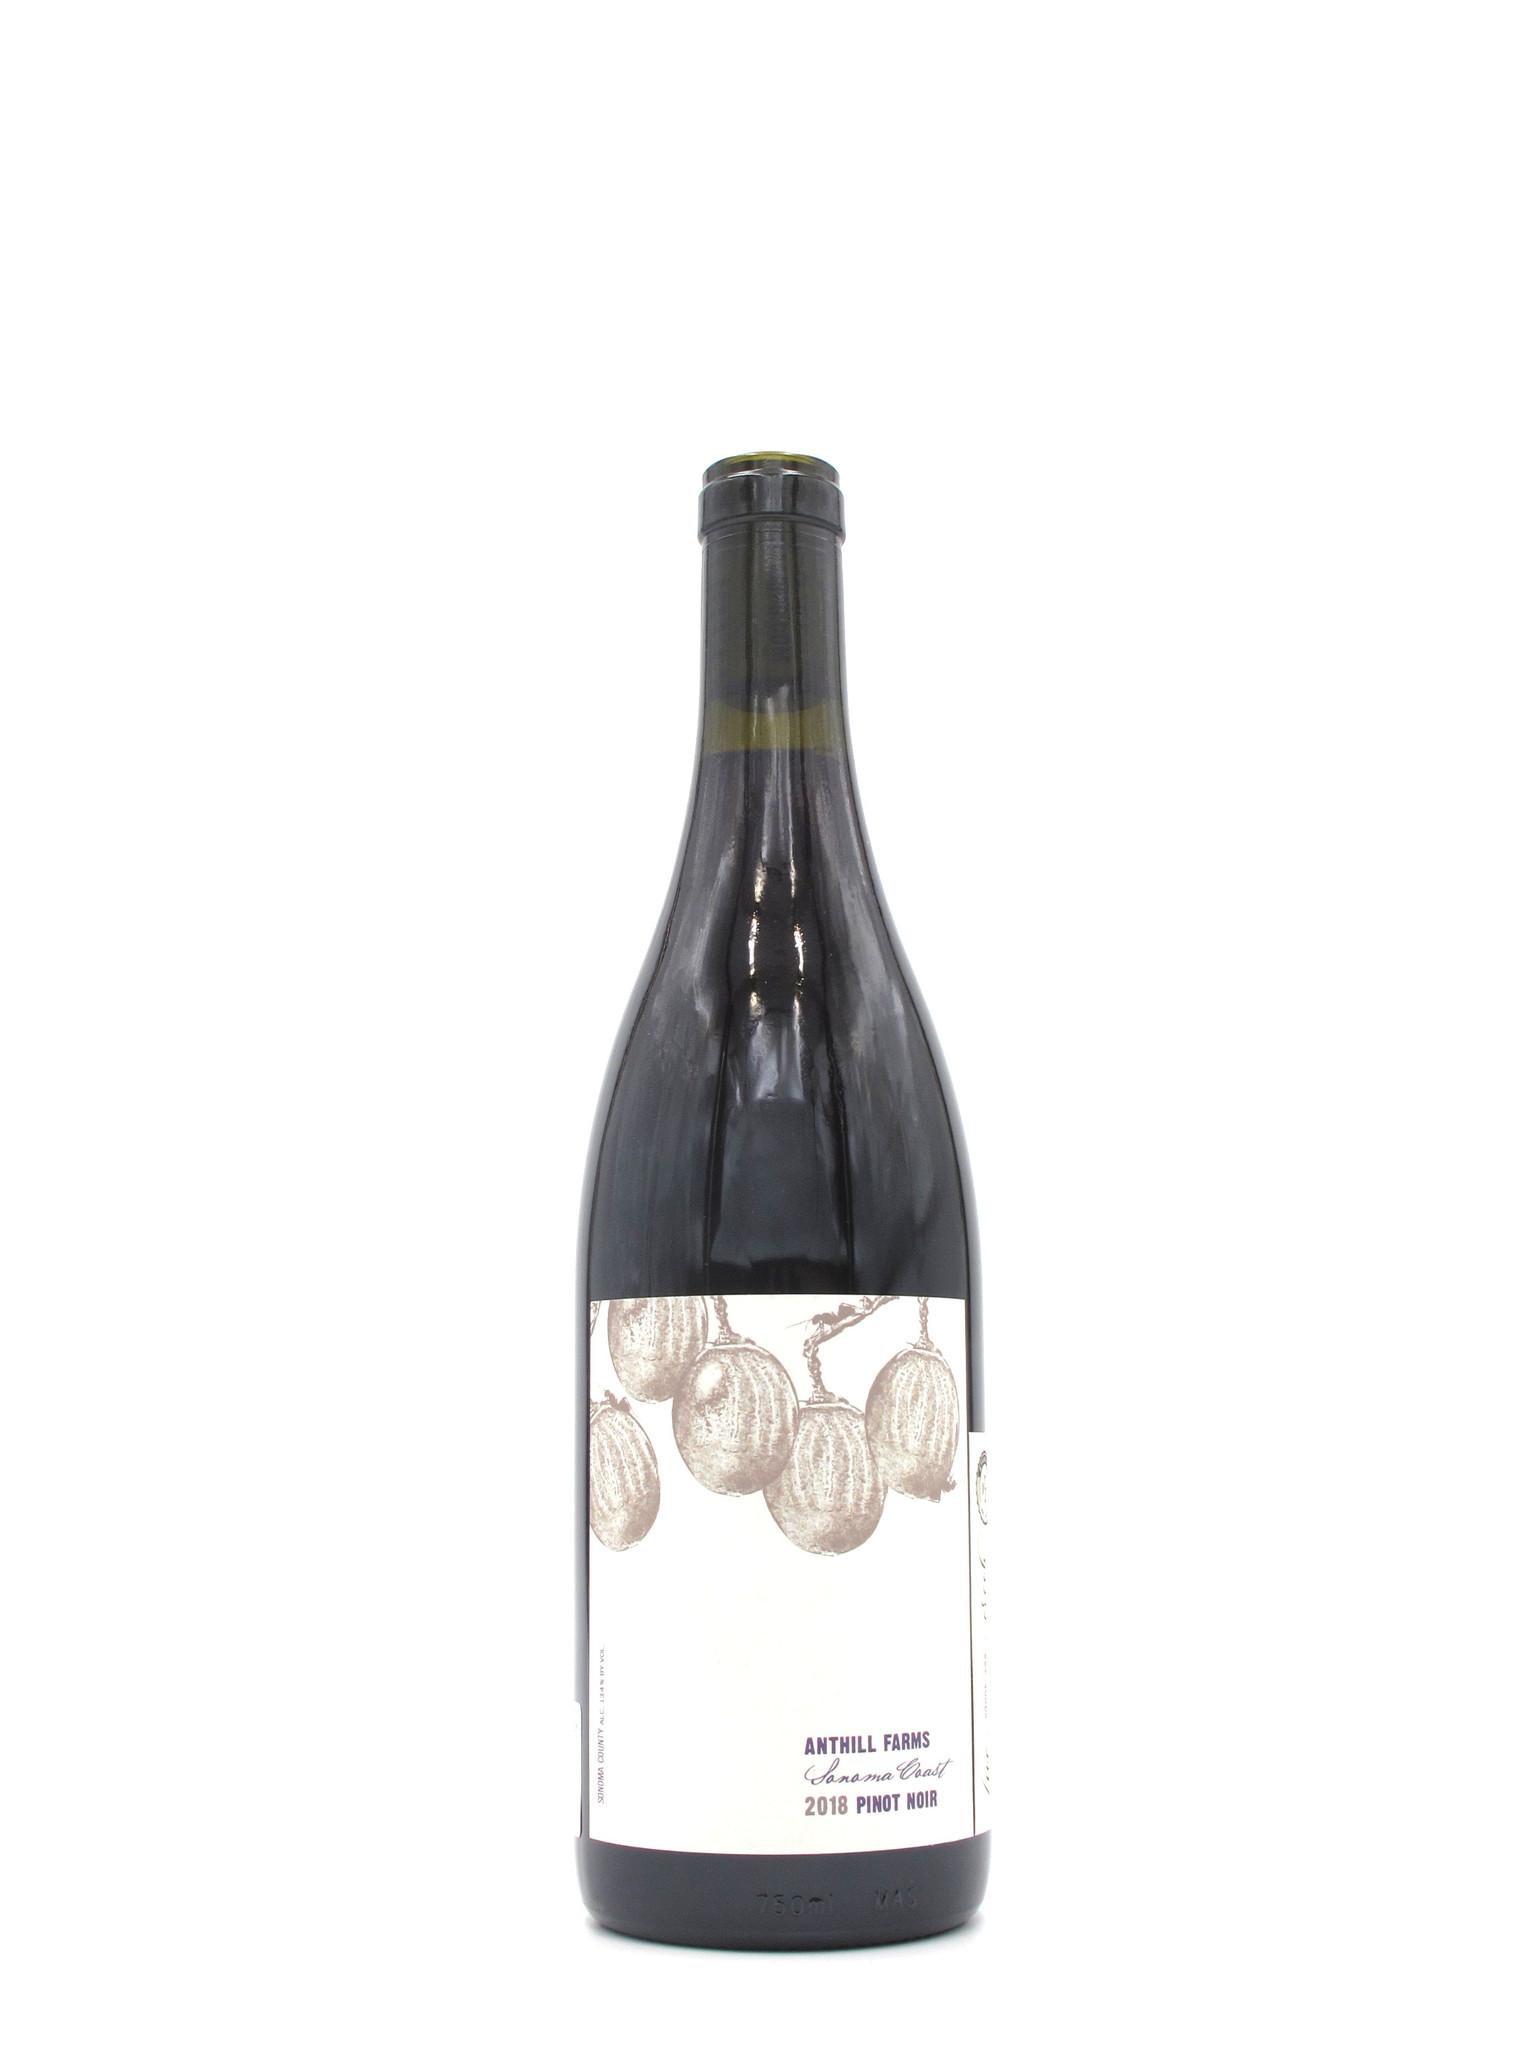 Anthill Farms 2018 Anthill Farms Sonoma Coast Pinot Noir 750ml